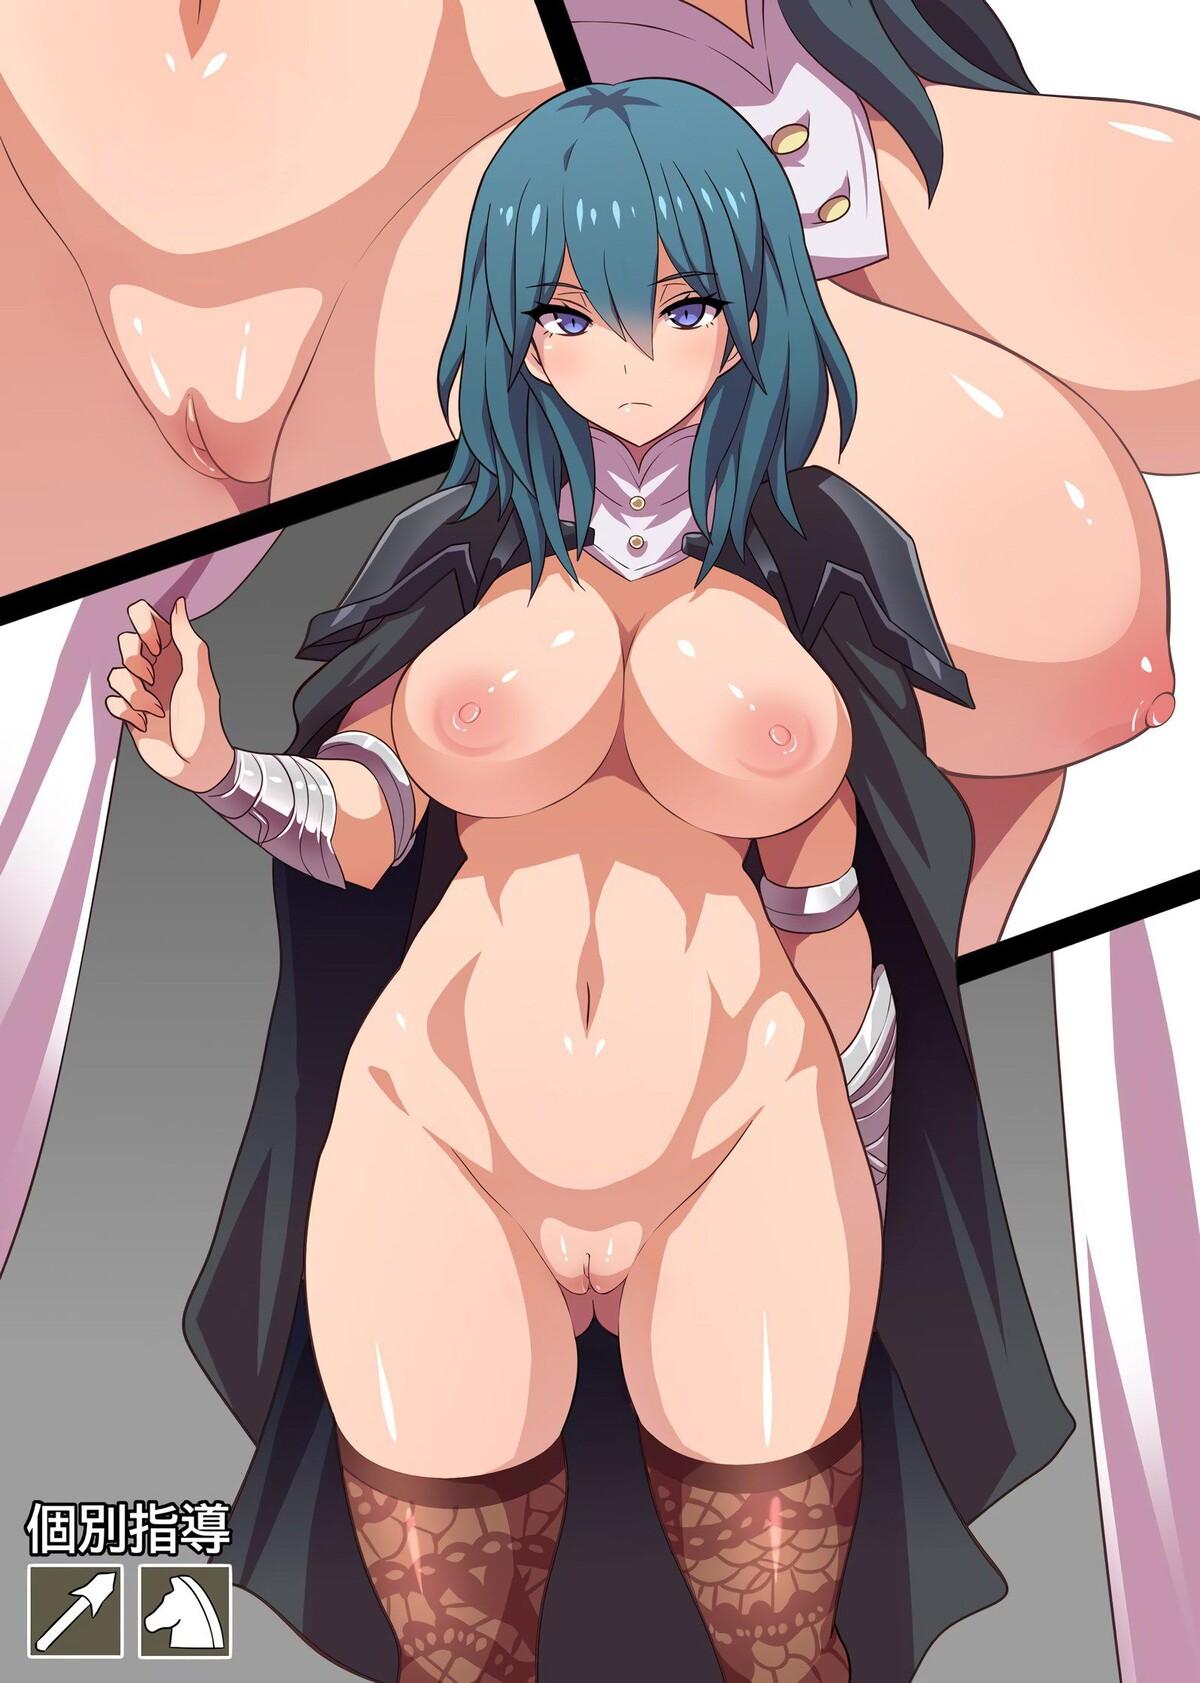 byleth_(female)077